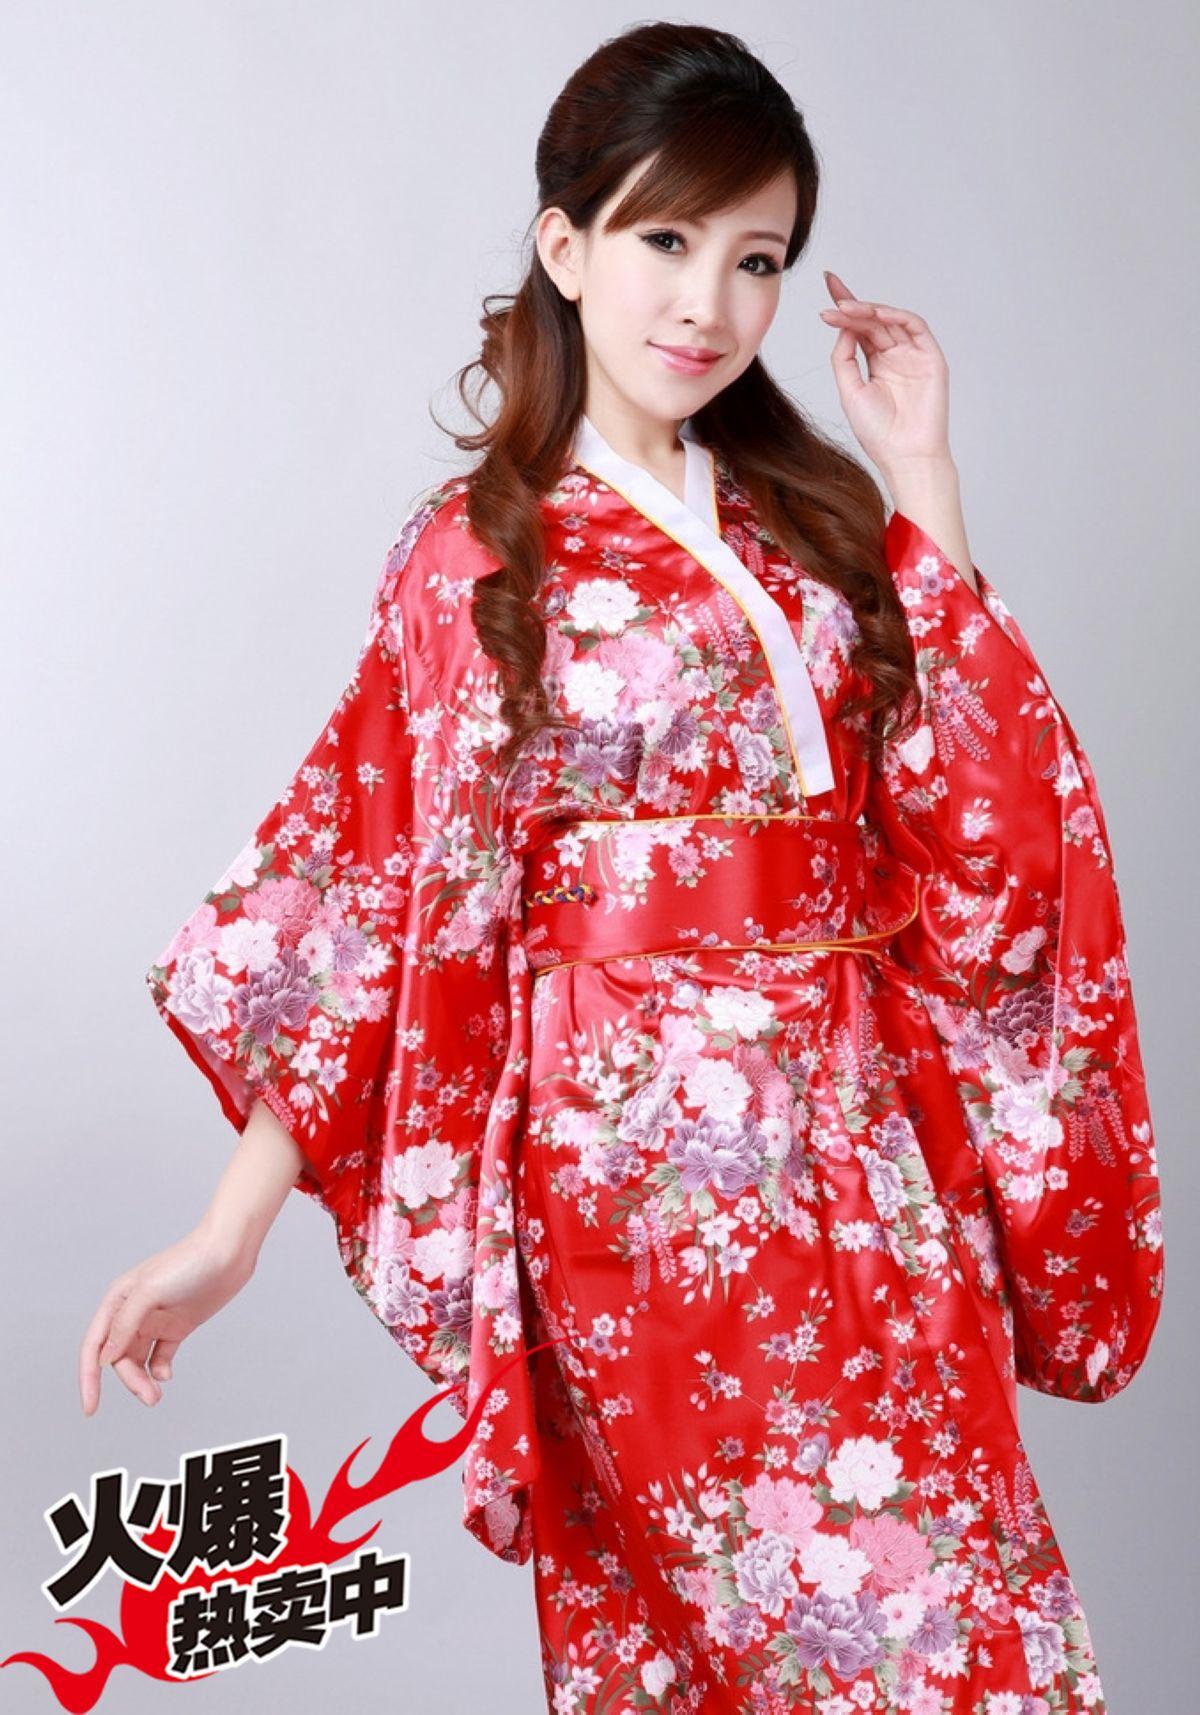 Национальный  костюм 日本和服 女款 浴衣 樱花正装 夜店服饰 影楼演出服套装